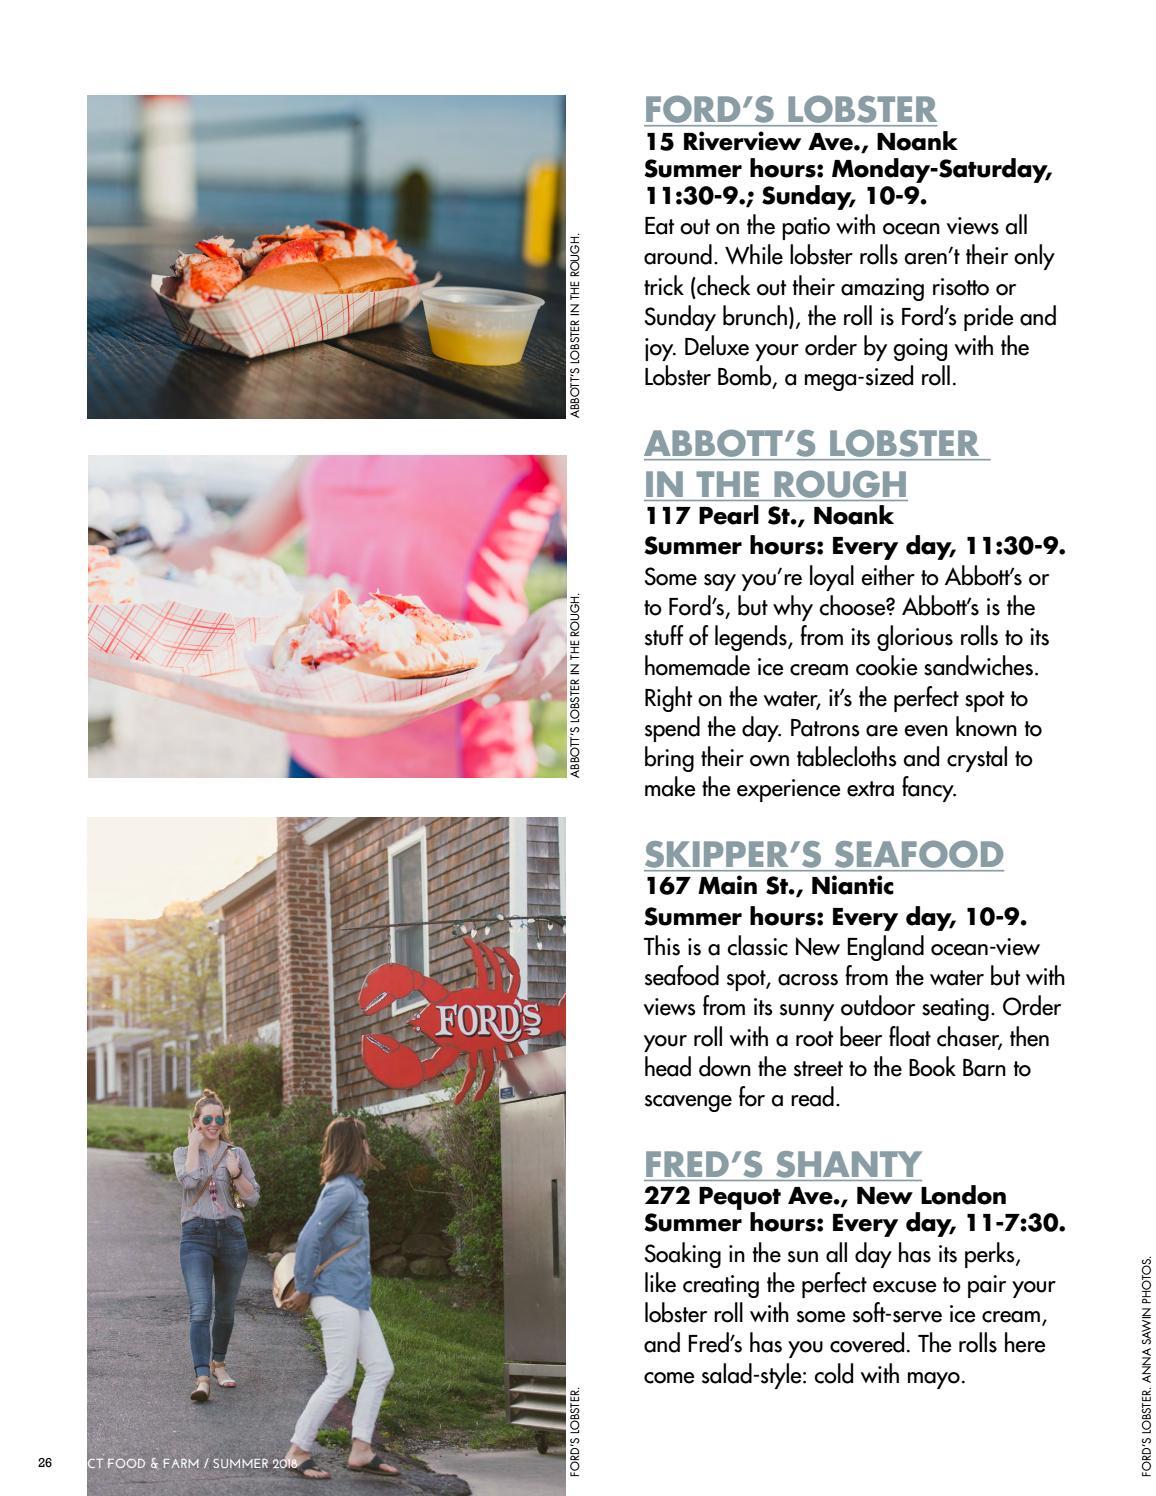 Connecticut Food & Farm Magazine, Summer 2018, Volume 13